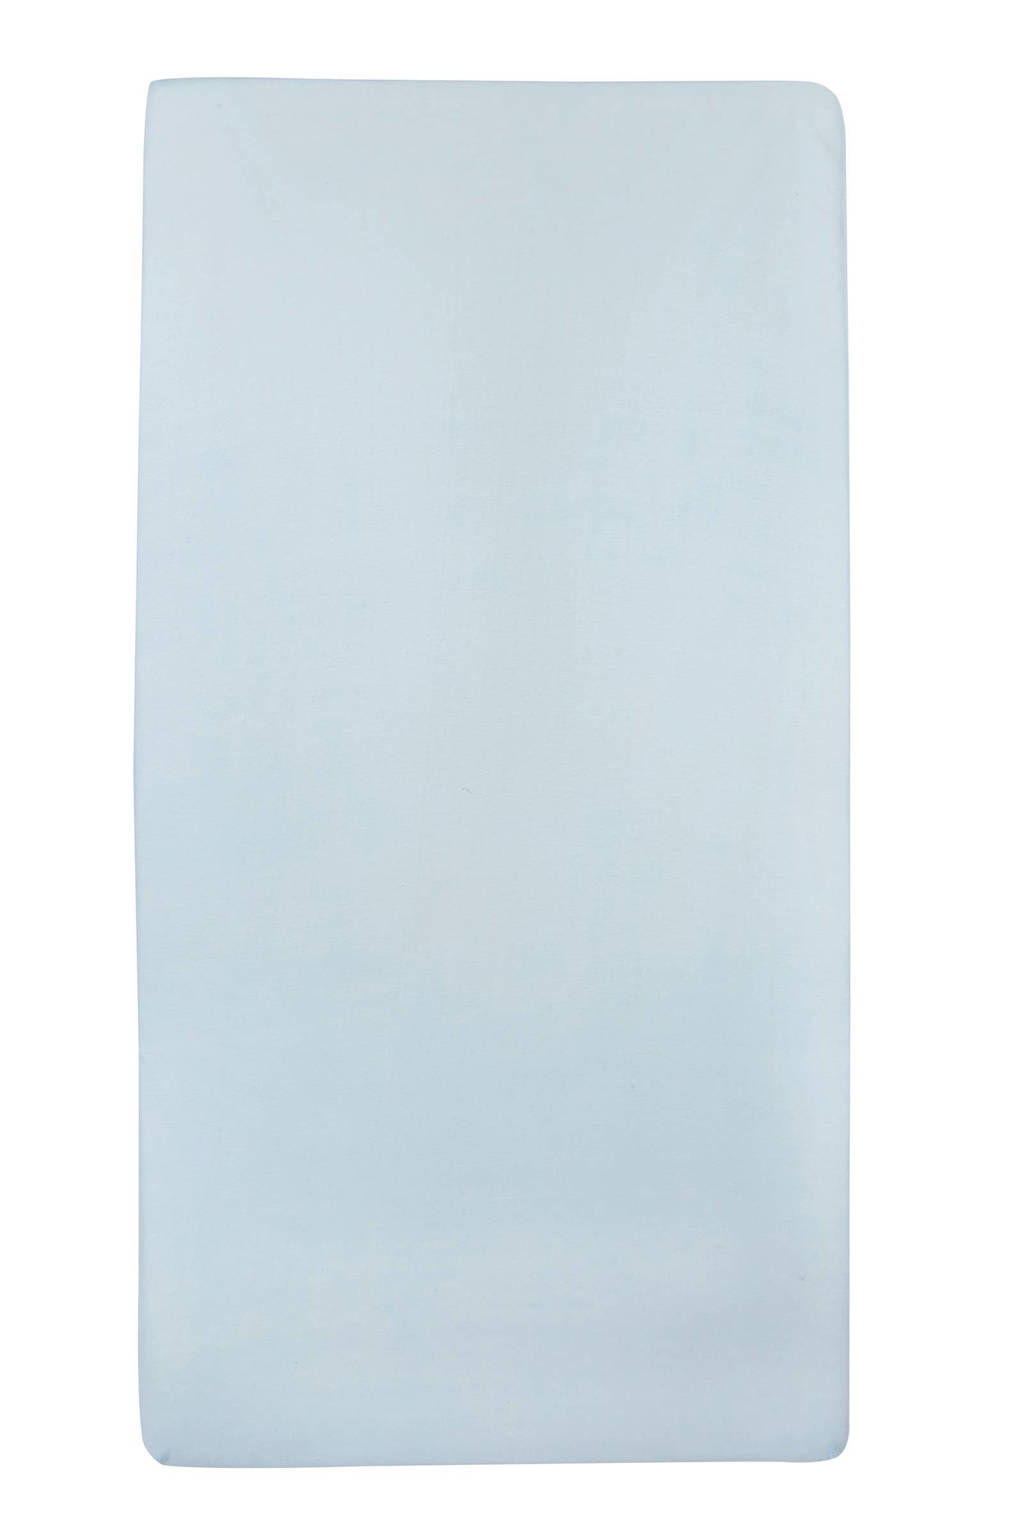 Meyco jersey hoeslaken wieg 40x80/90 cm, Lichtblauw